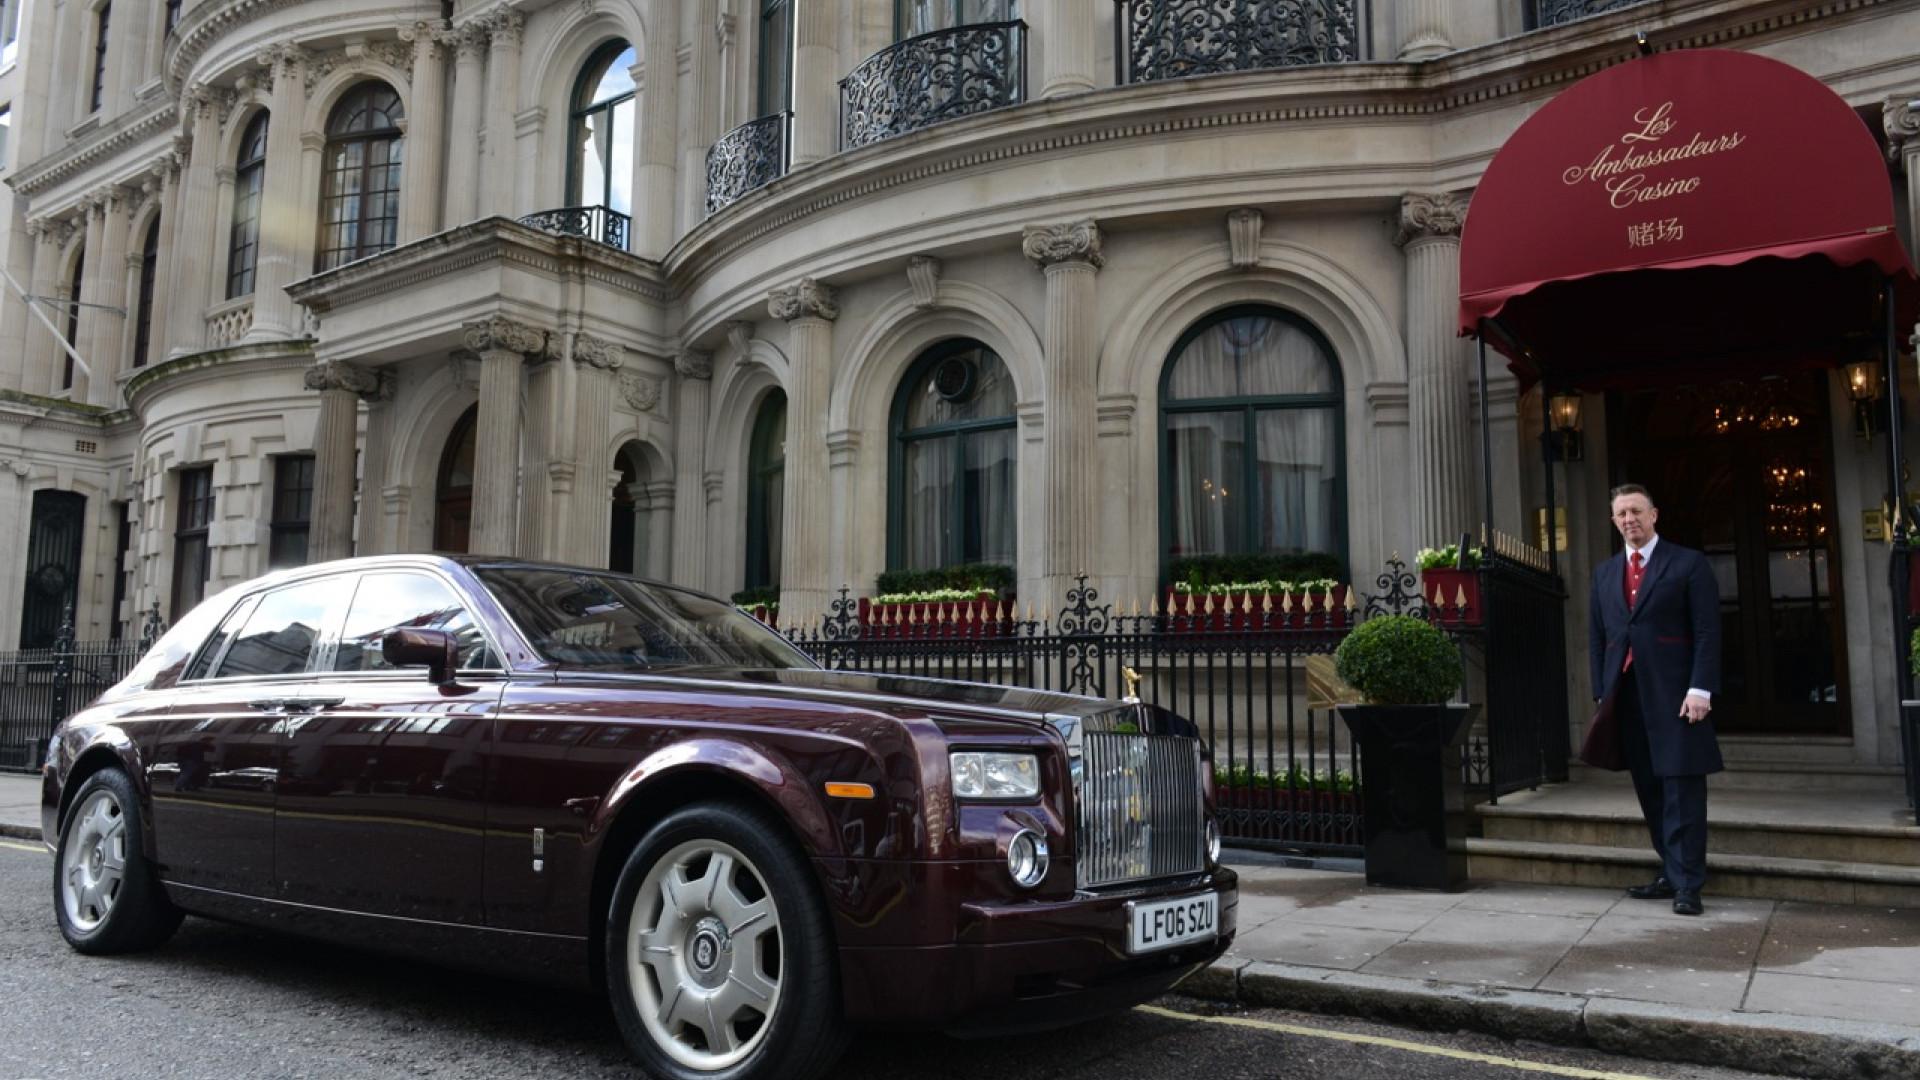 Les Ambassadeurs Entrance: Best London Casinos